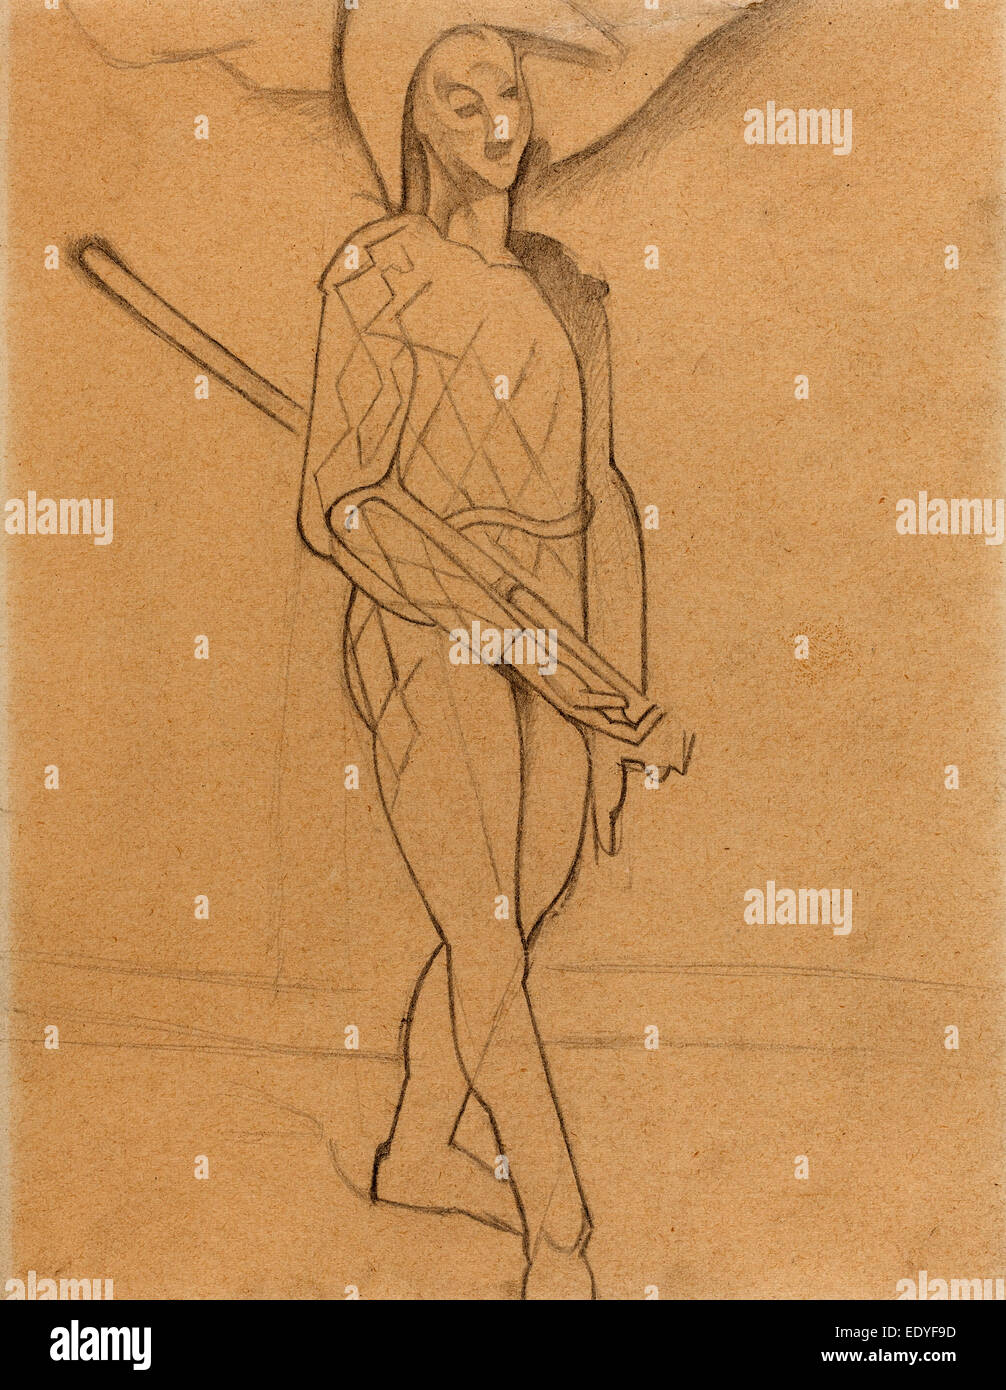 Juan Gris después de Paul Cézanne, Arlequín, Español, 1887 - 1927, 1916, Grafito sobre papel Imagen De Stock